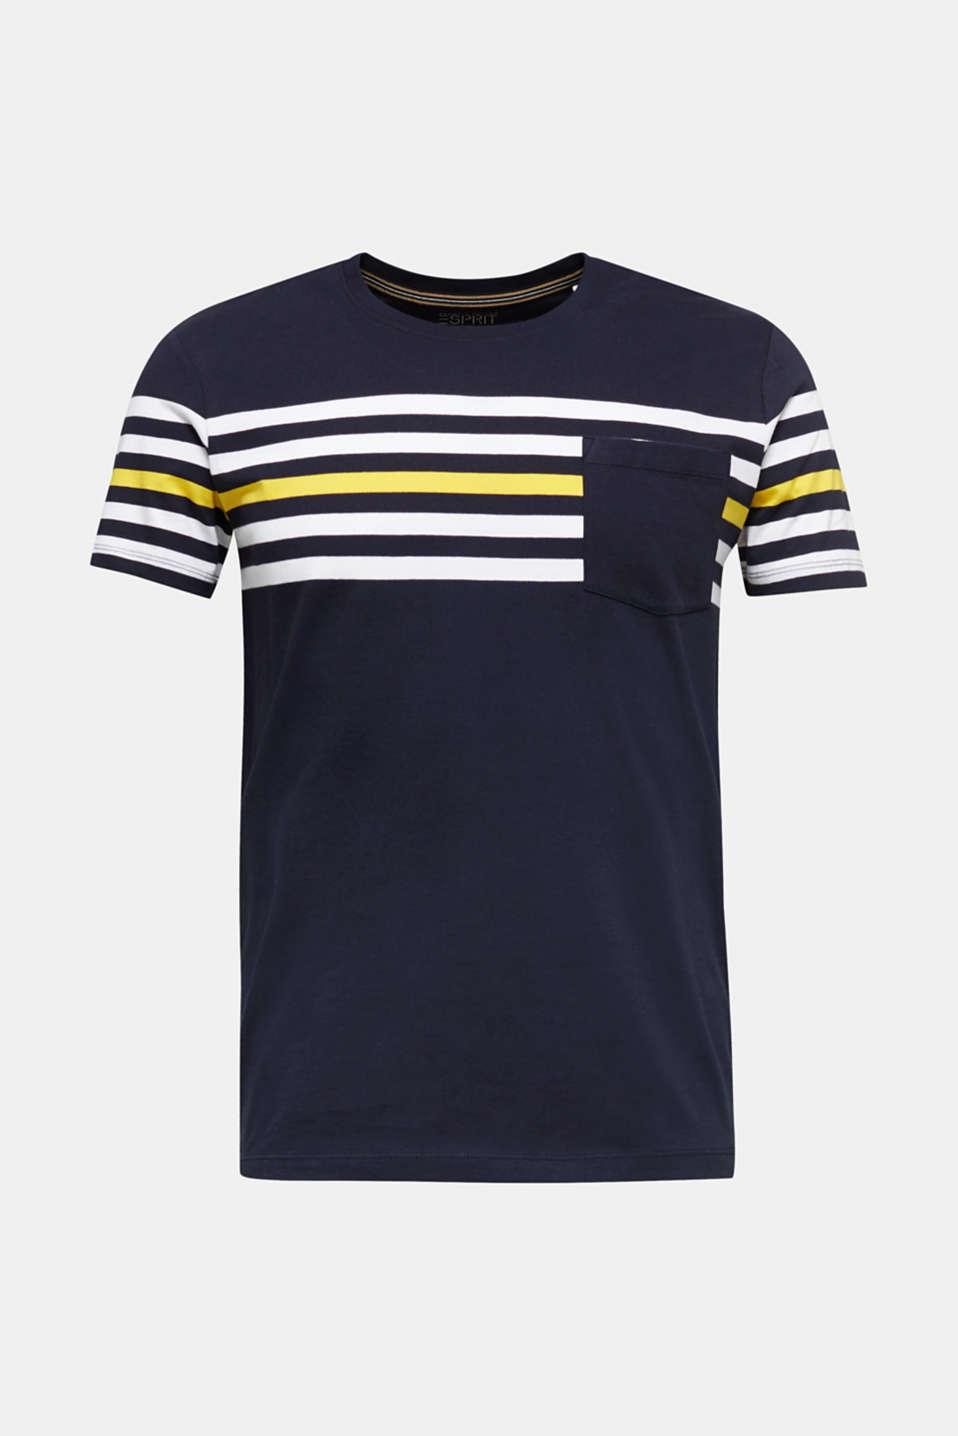 T-Shirts, NAVY 3, detail image number 6